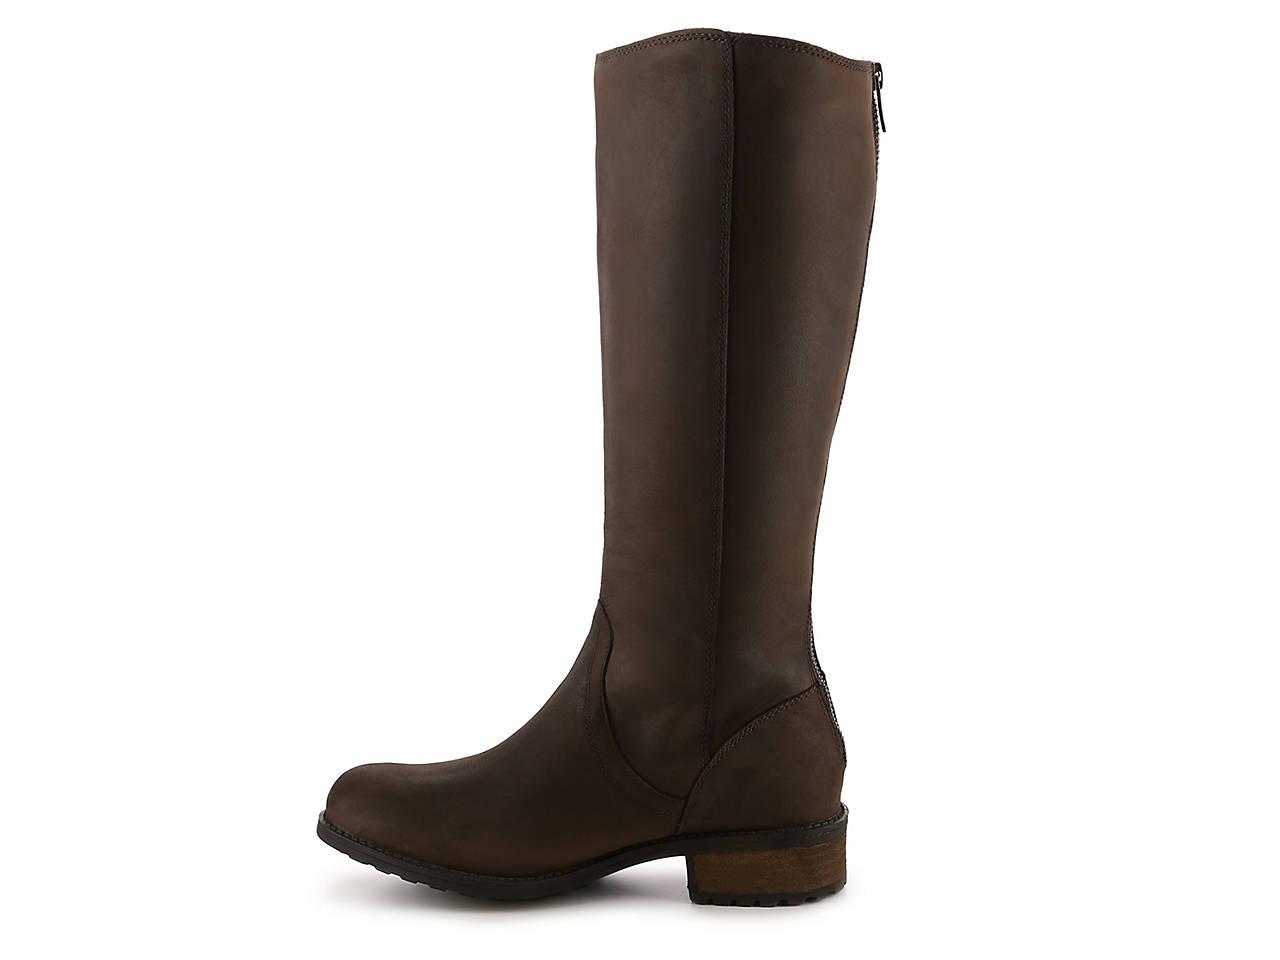 ugg australia women's w seldon boot